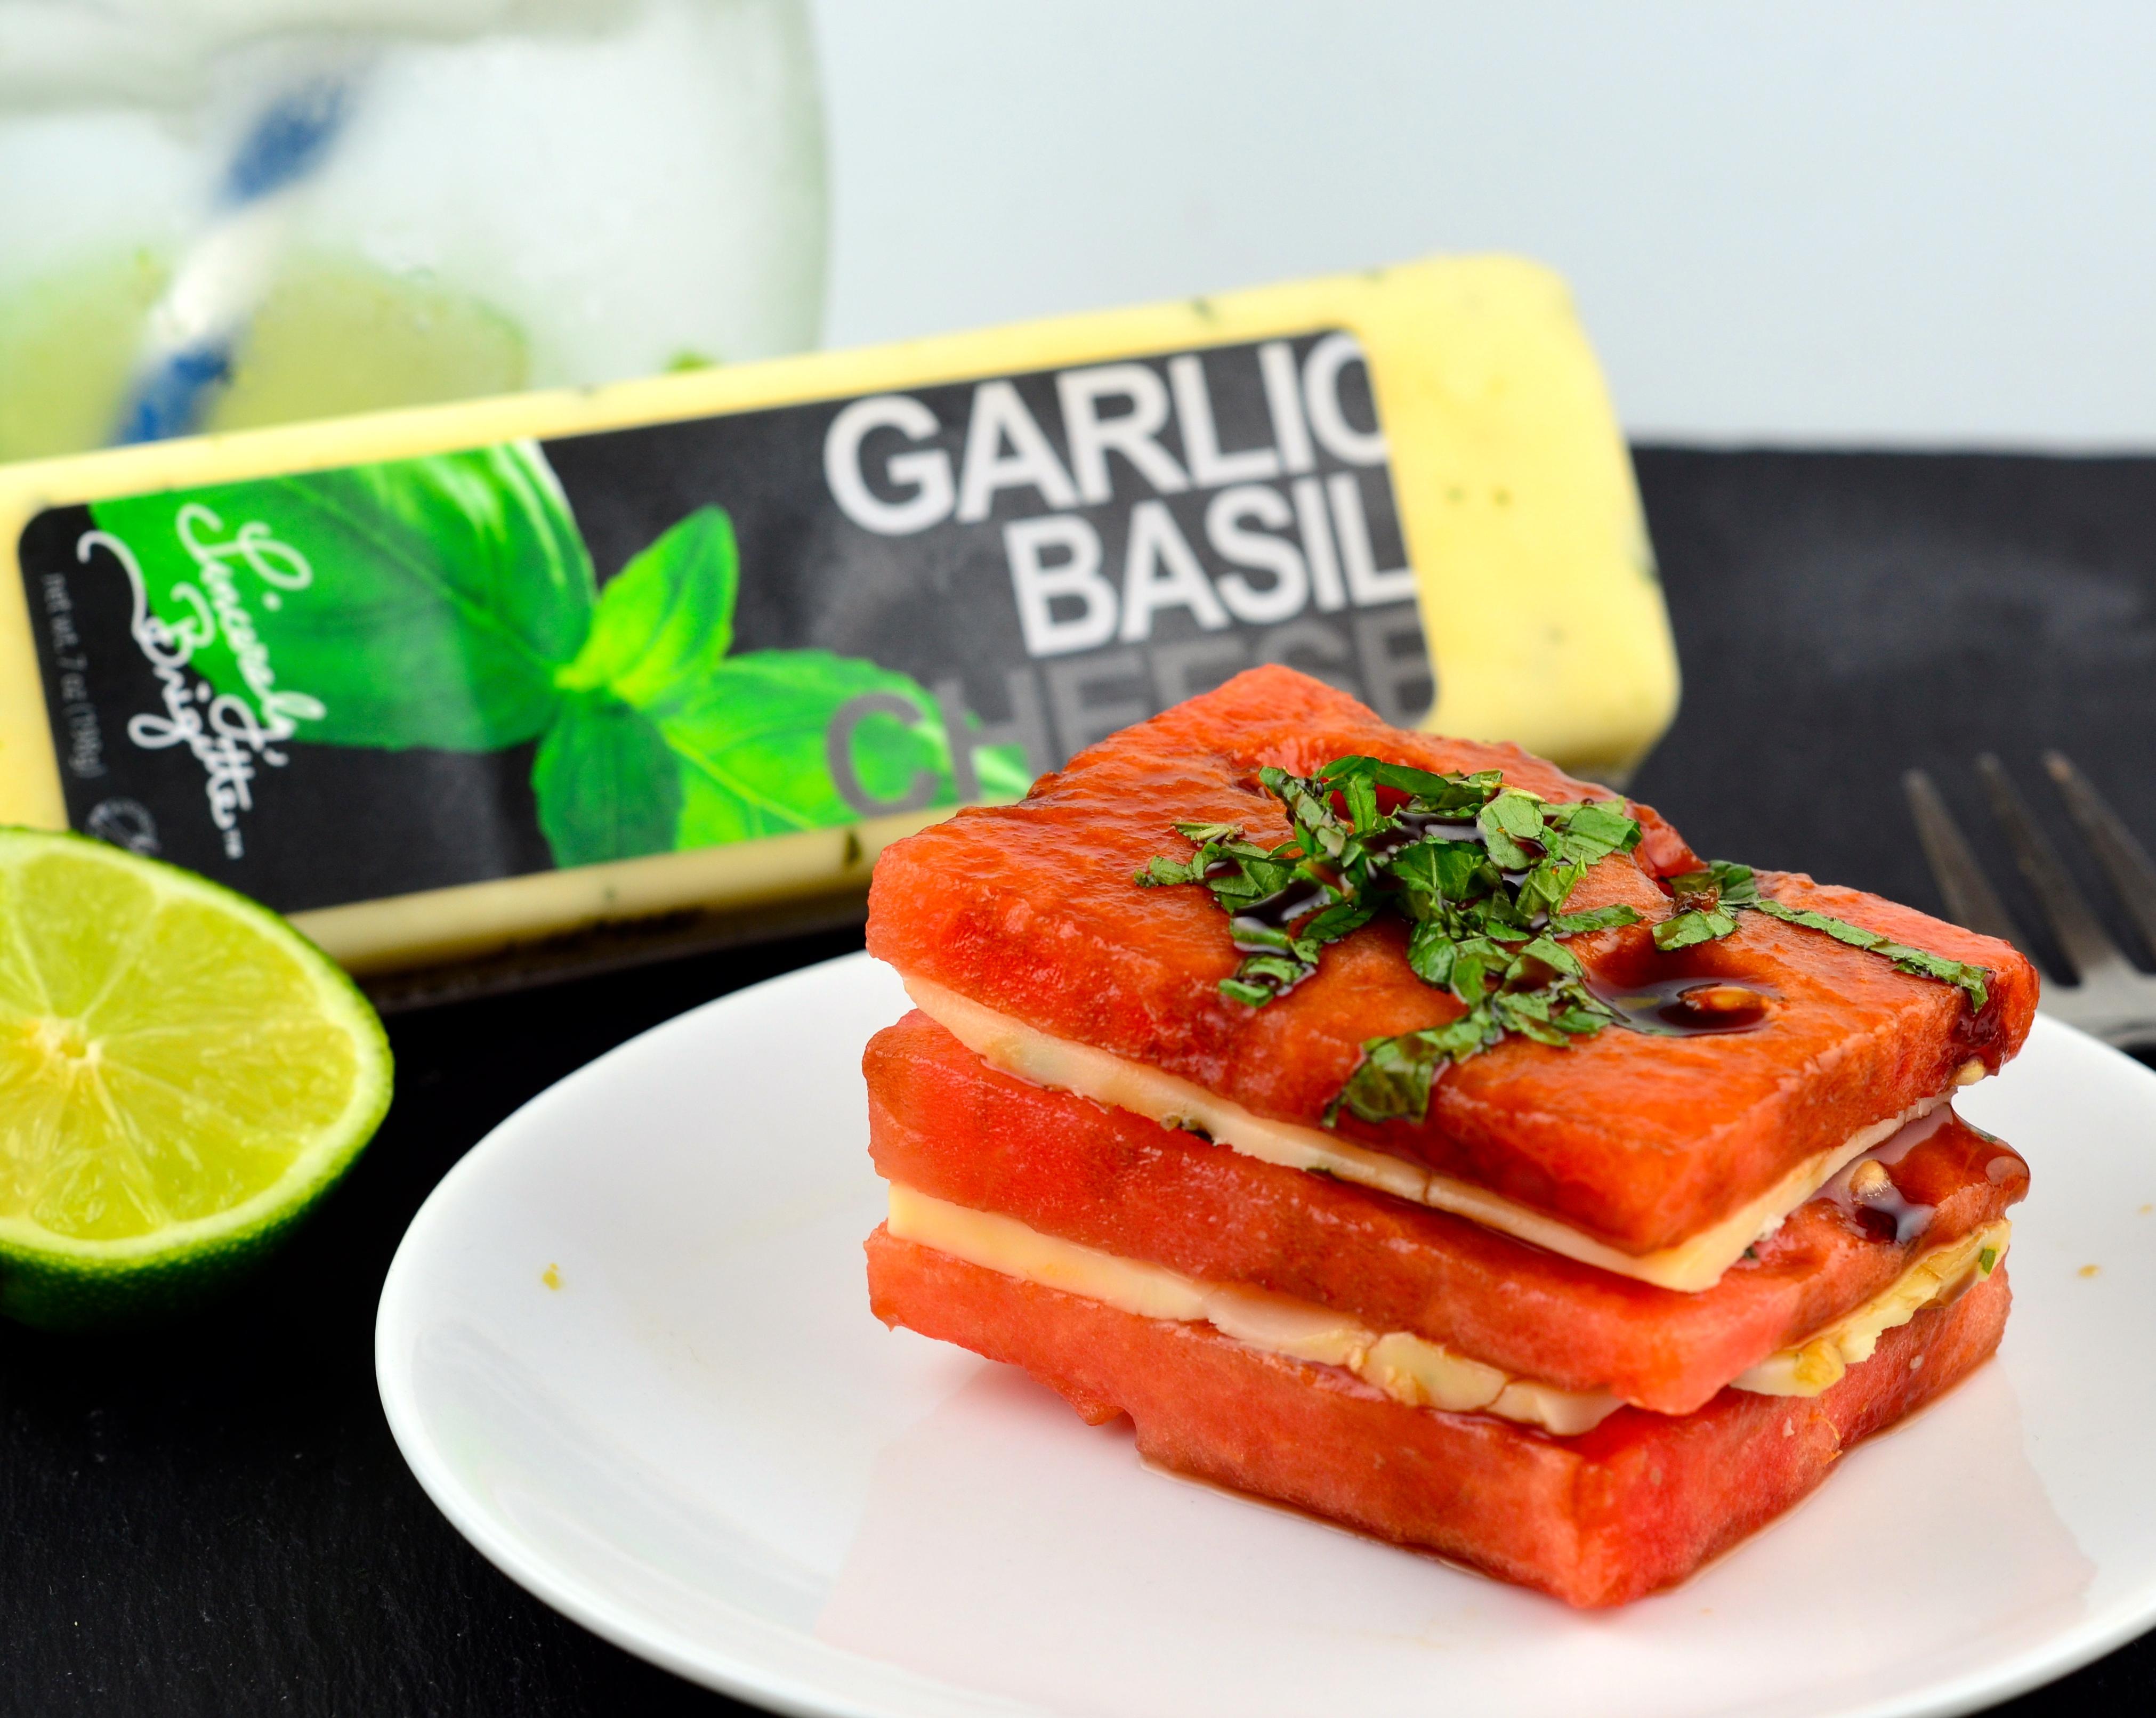 Watermelon & Cheese Napoleon With Balsamic Glaze